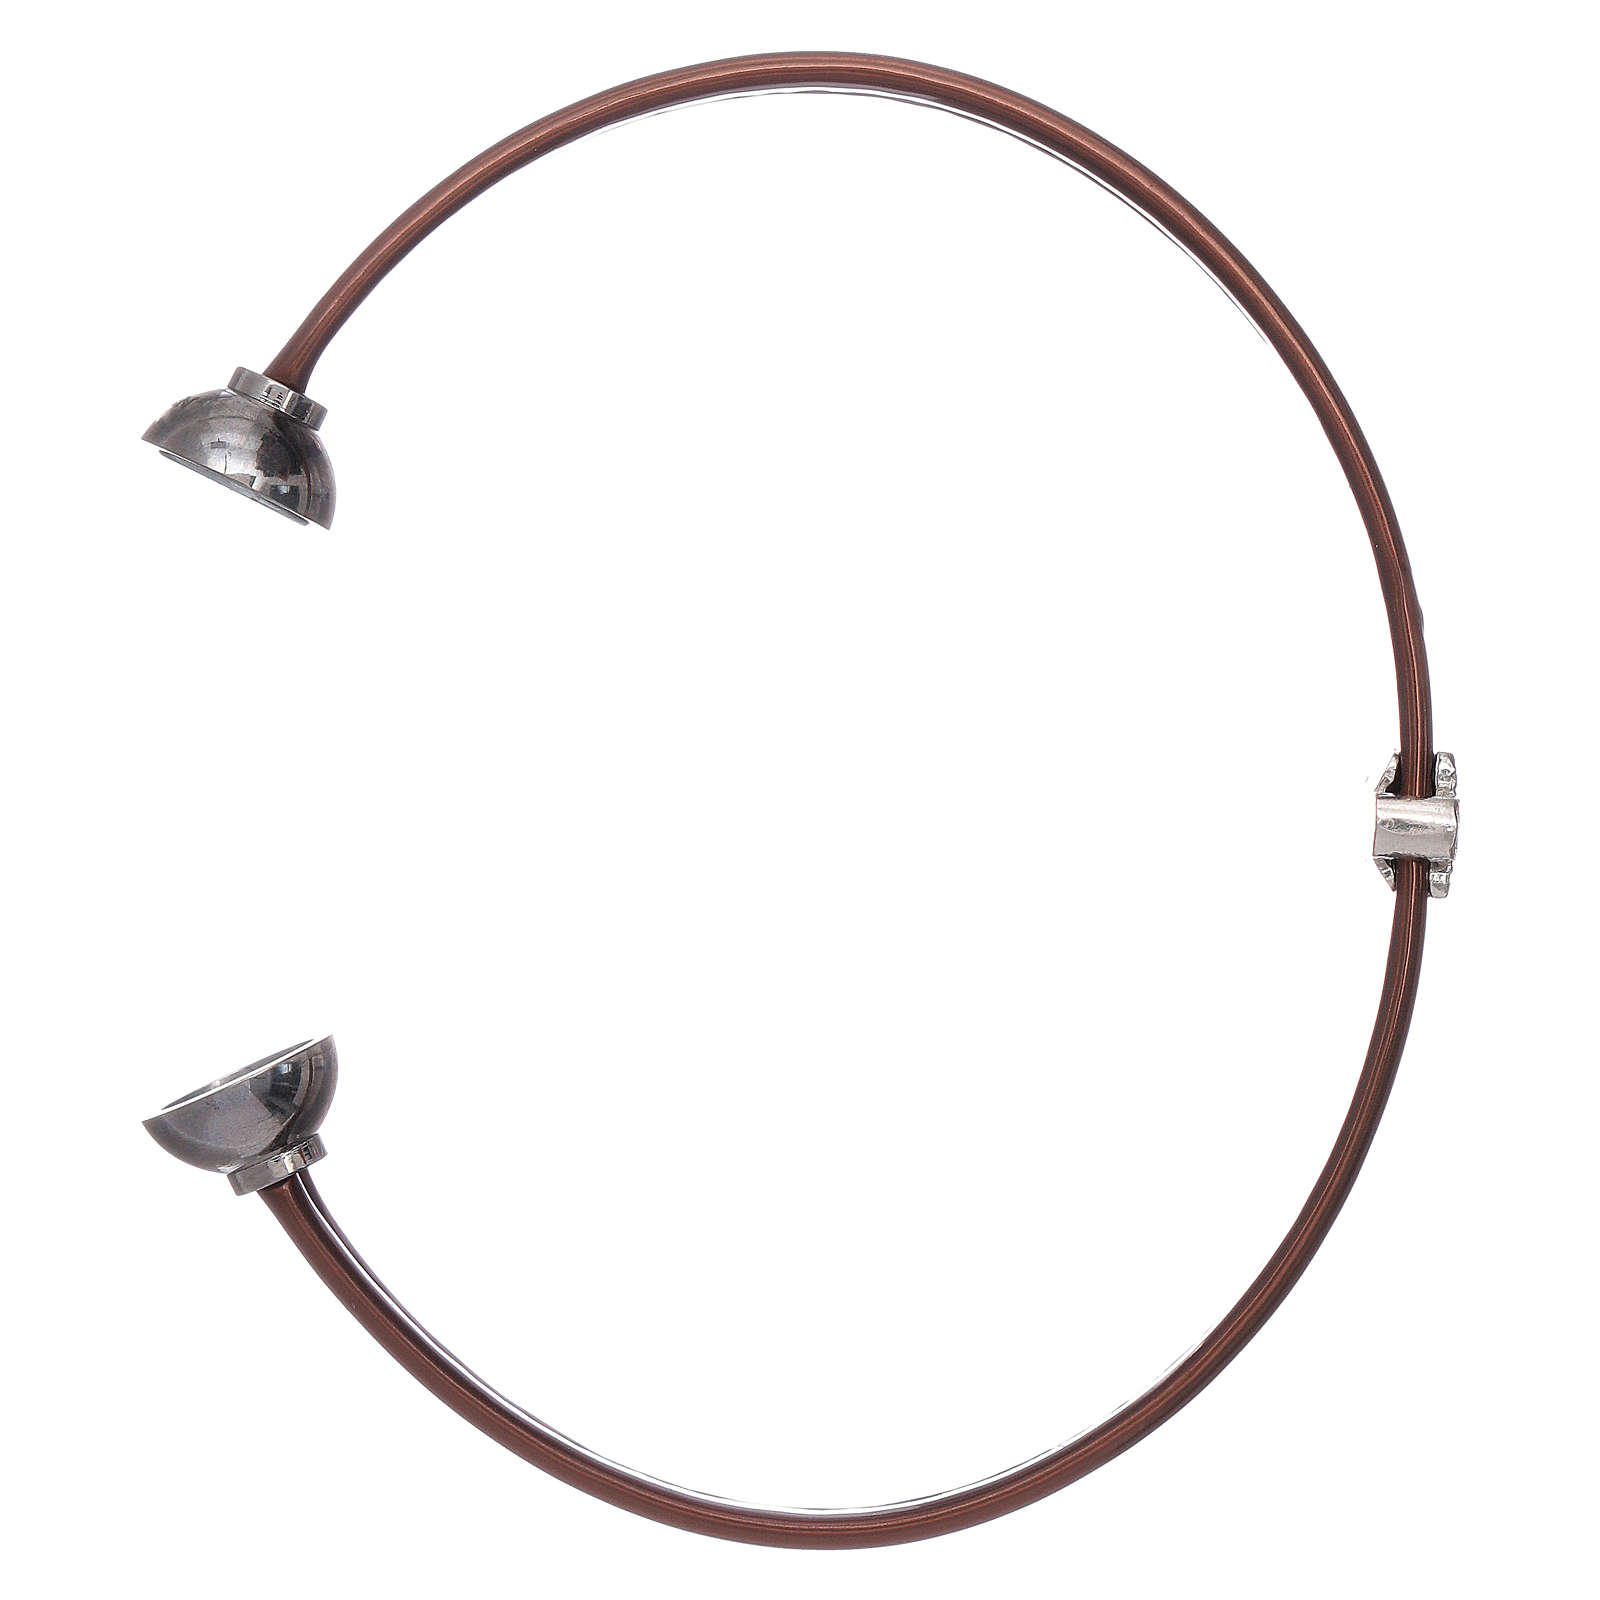 Bracelet thermoplastique marron ange zircons argent 925 AMEN 4